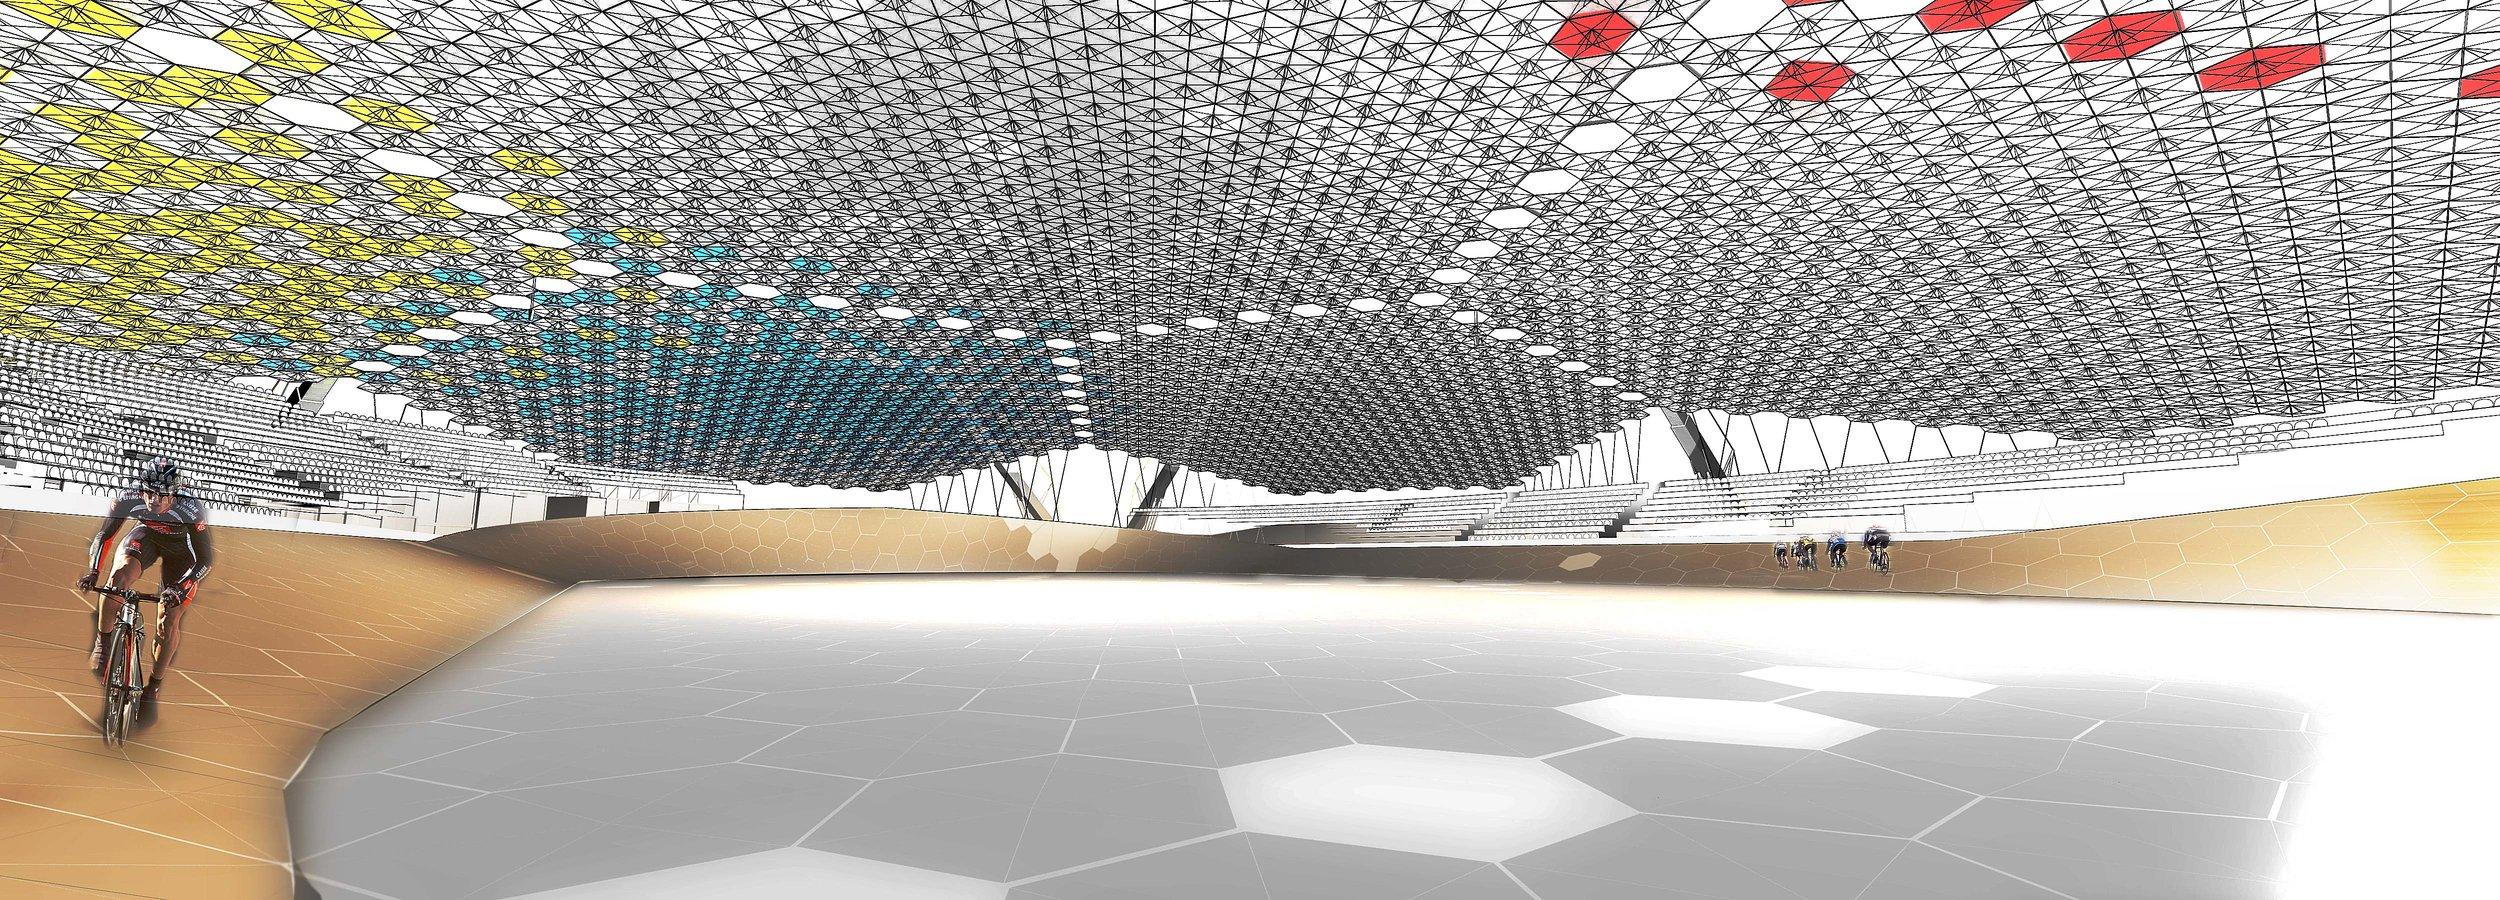 velodromo.competition.architecture.04